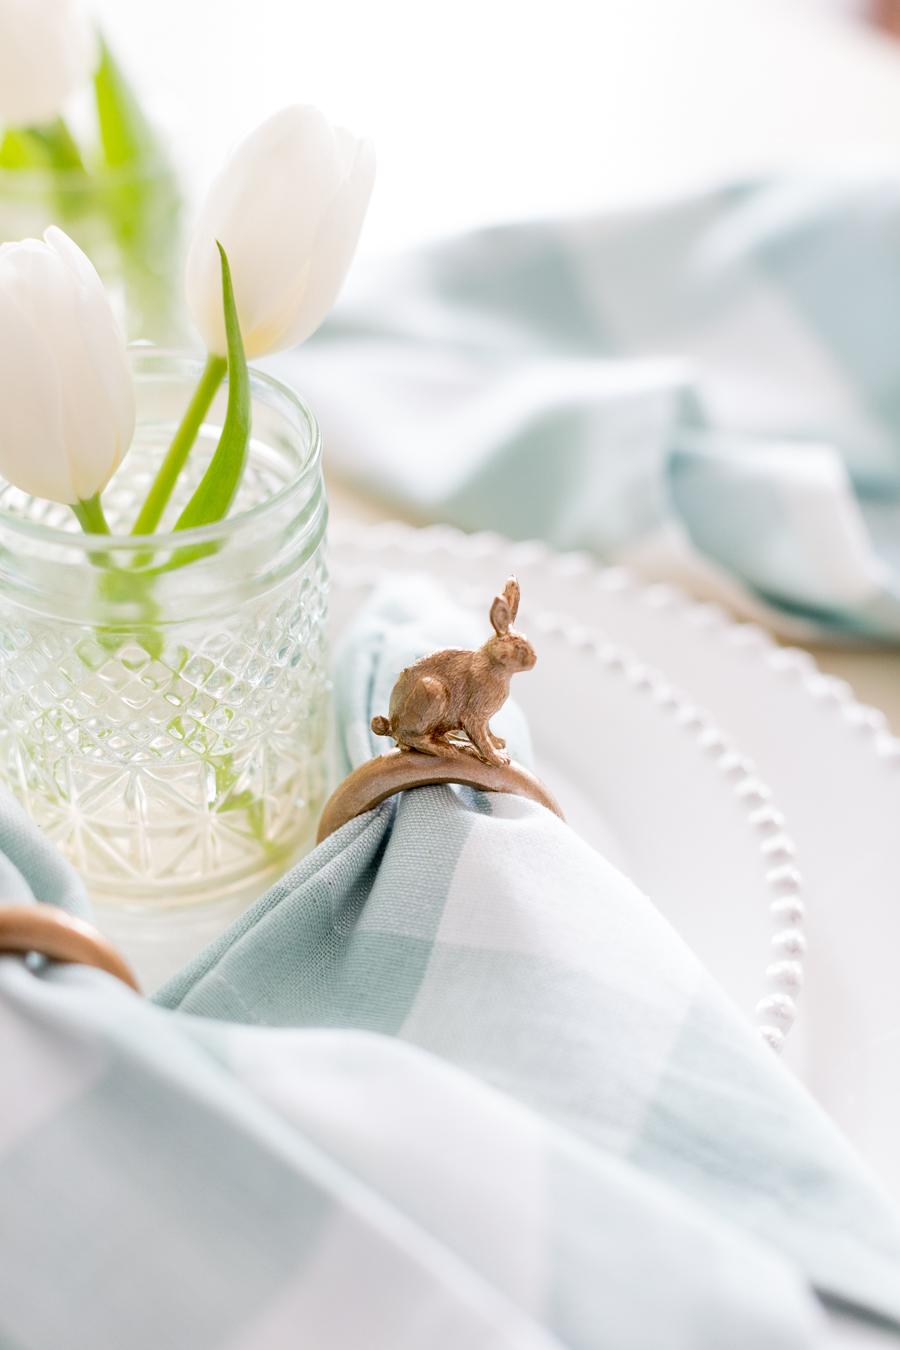 DIY Easter Bunny Napkin Ring